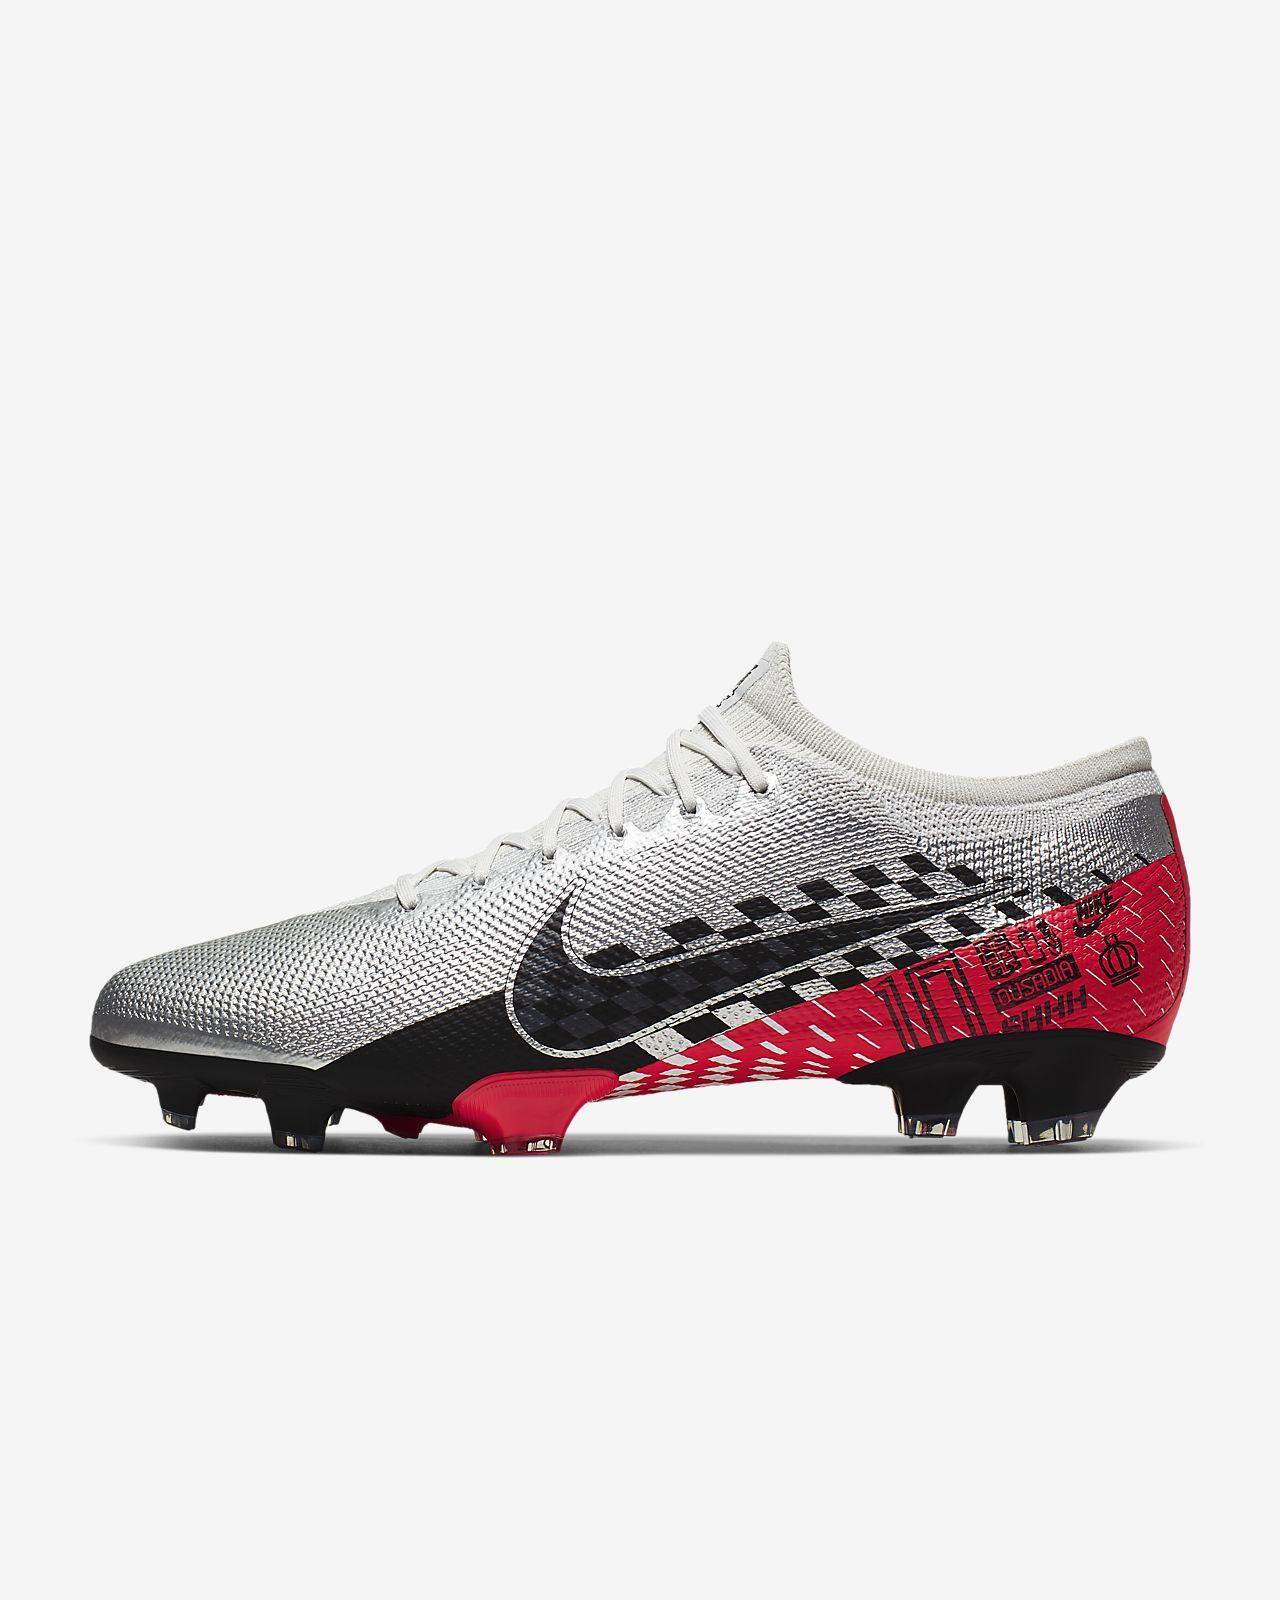 Chuteiras de futebol para terreno firme Nike Mercurial Vapor 13 Pro Neymar Jr. FG